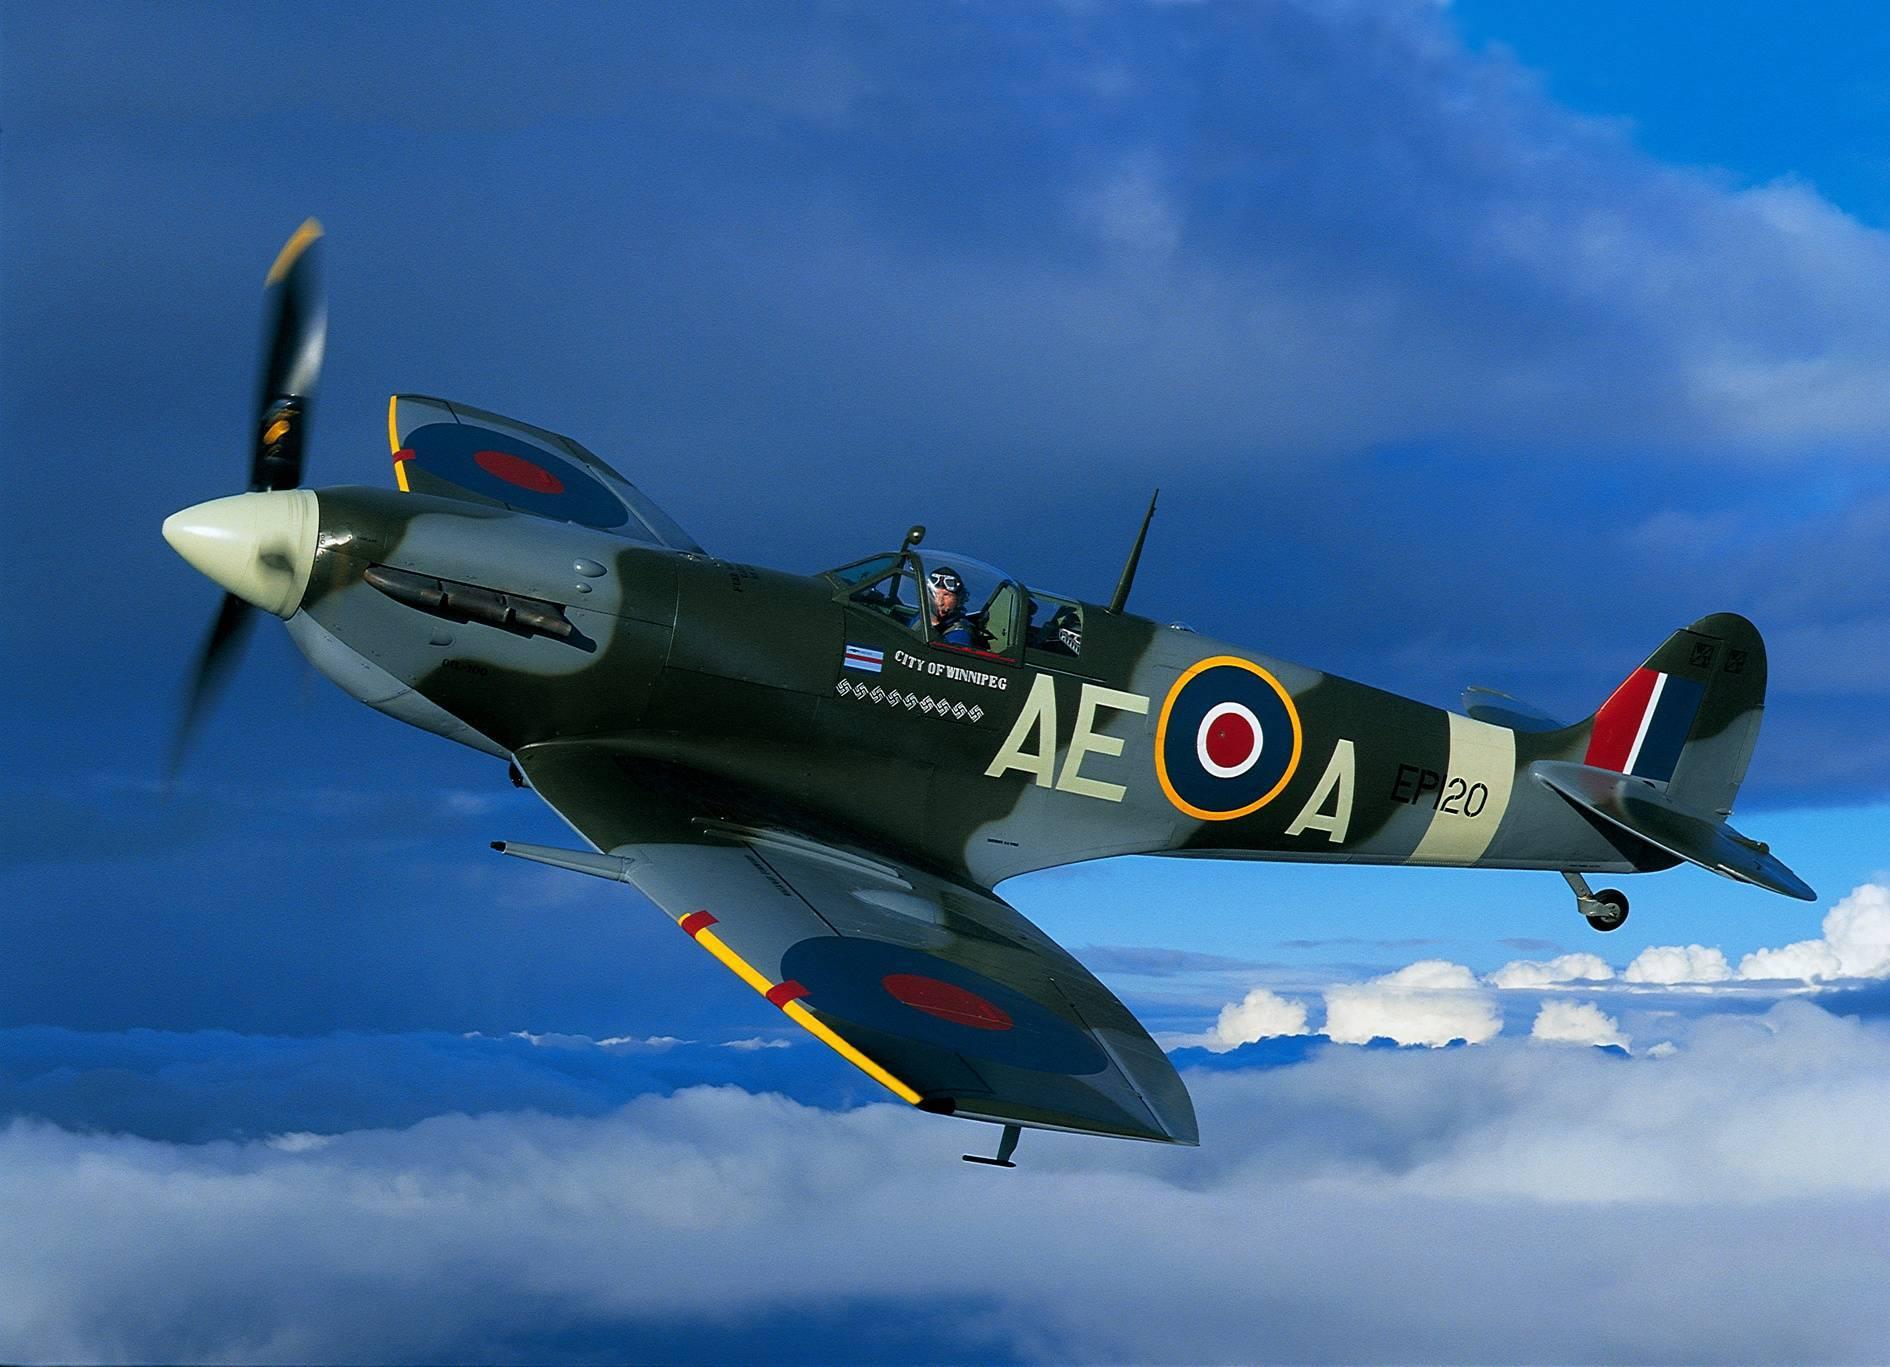 Spitfire mk iib